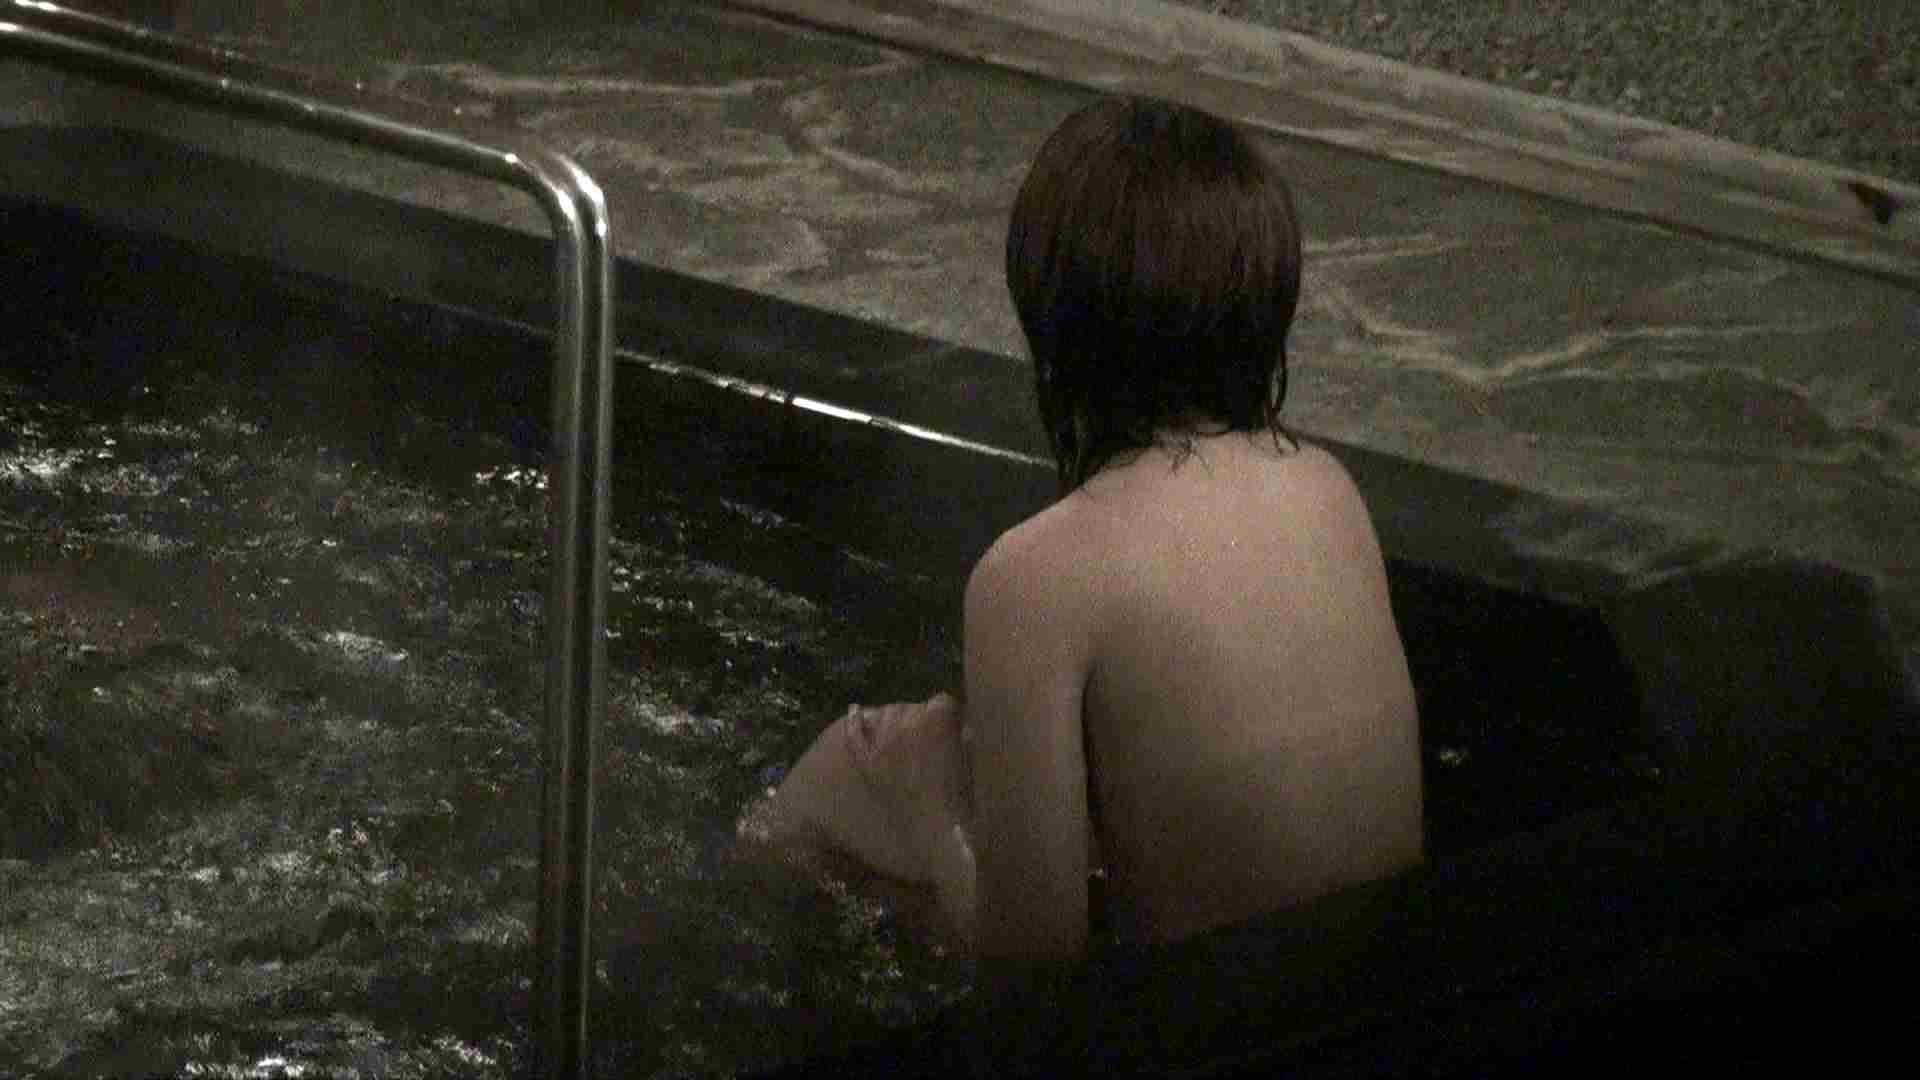 Aquaな露天風呂Vol.411 盗撮 | HなOL  49pic 4